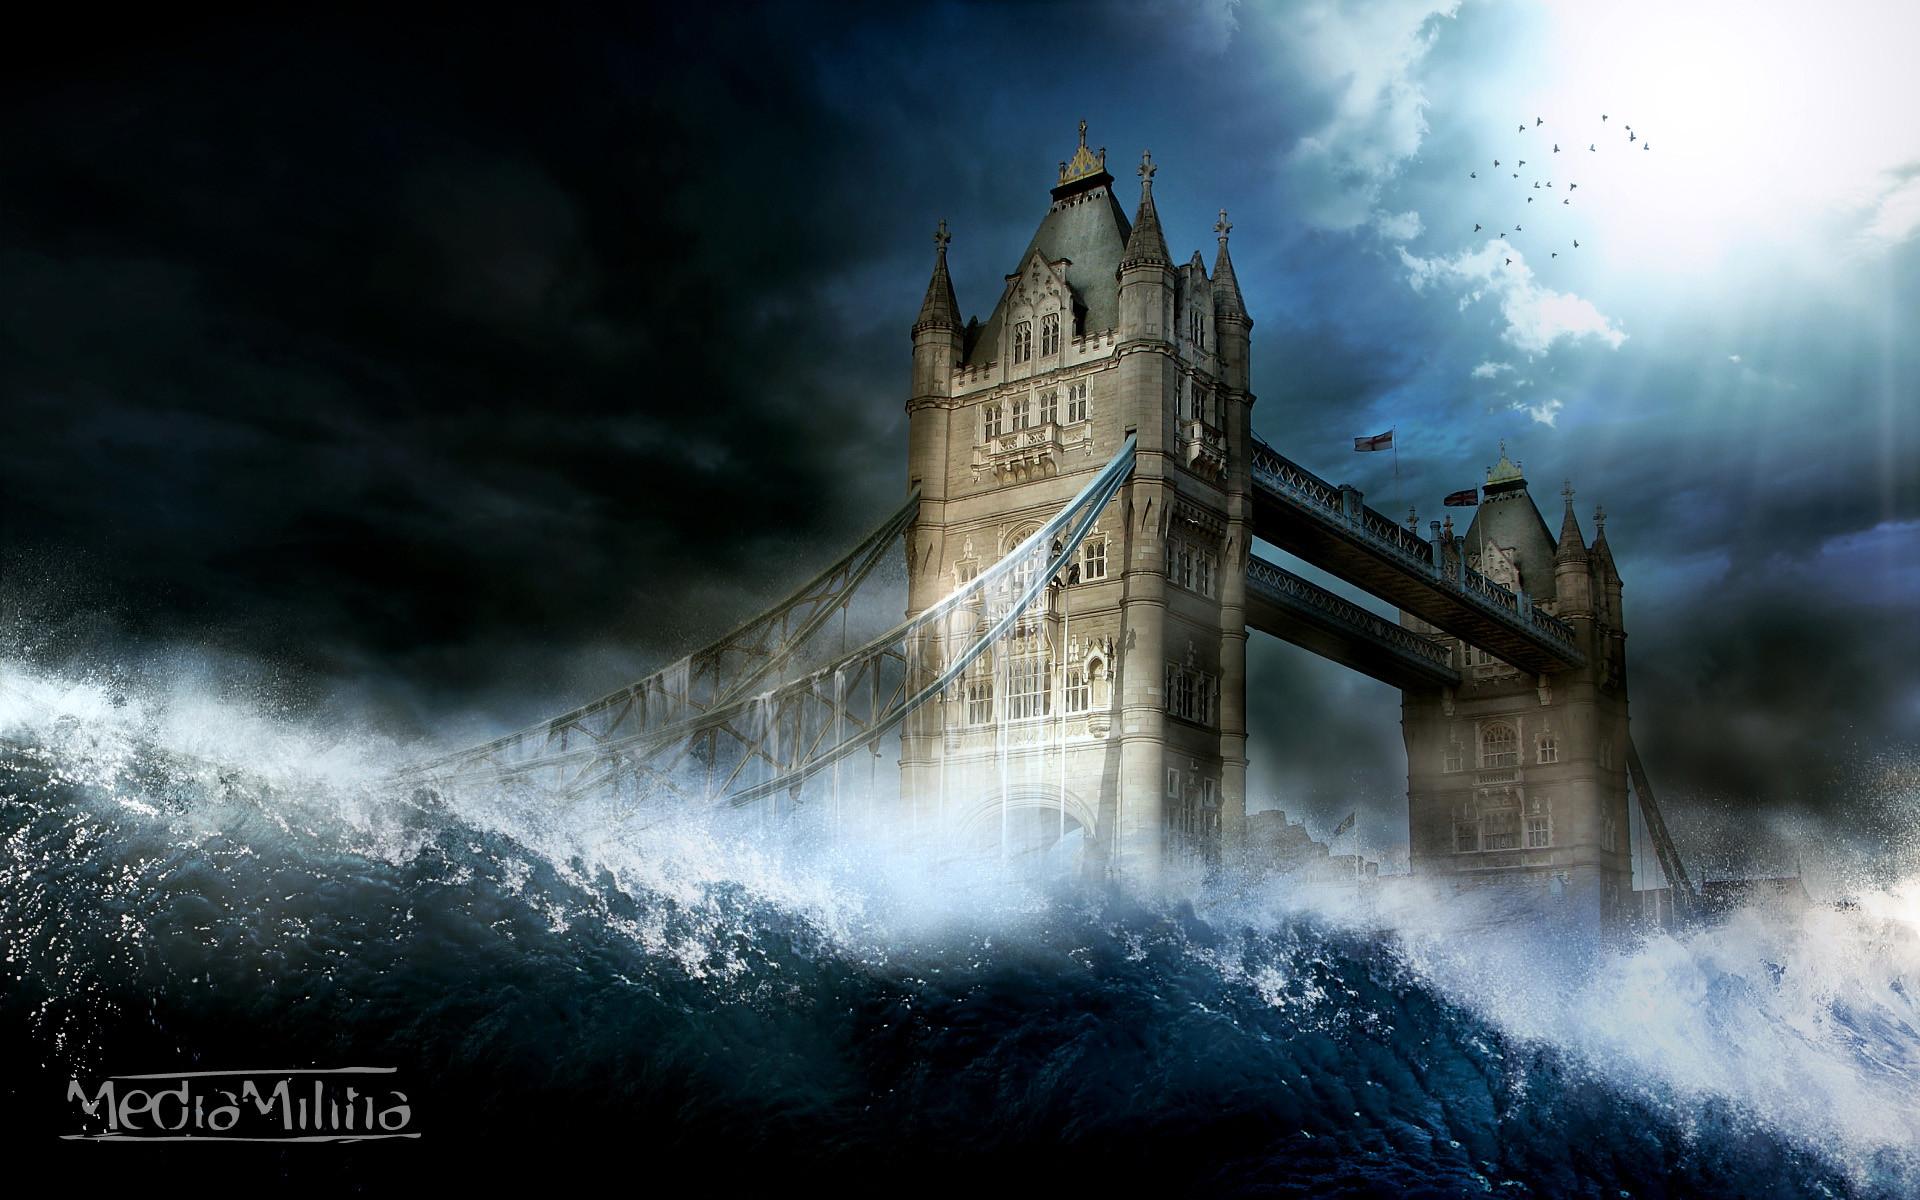 Res: 1920x1200, Tags: London bridge Tower